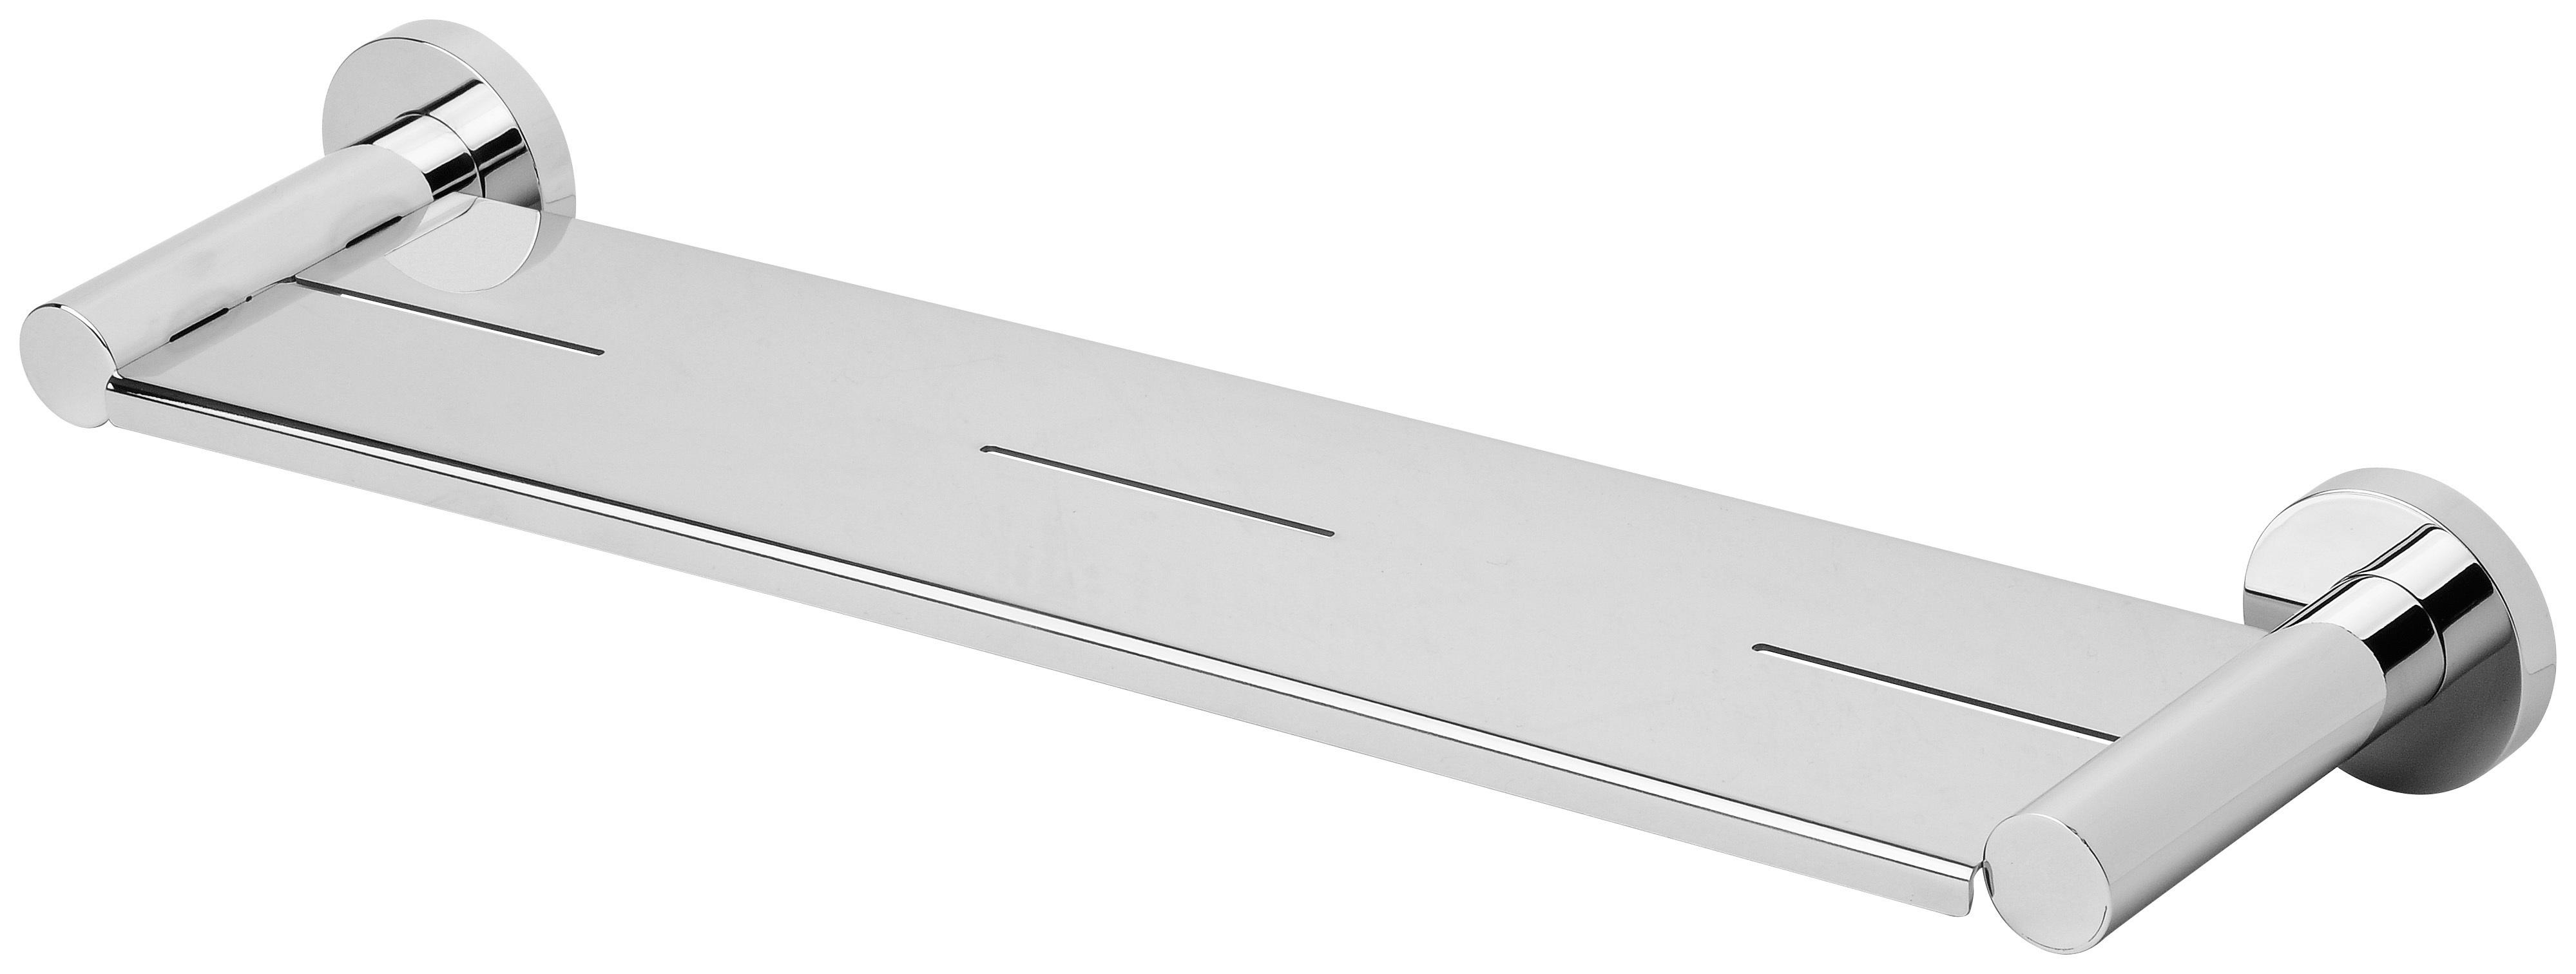 Raddii metal shelf chrome